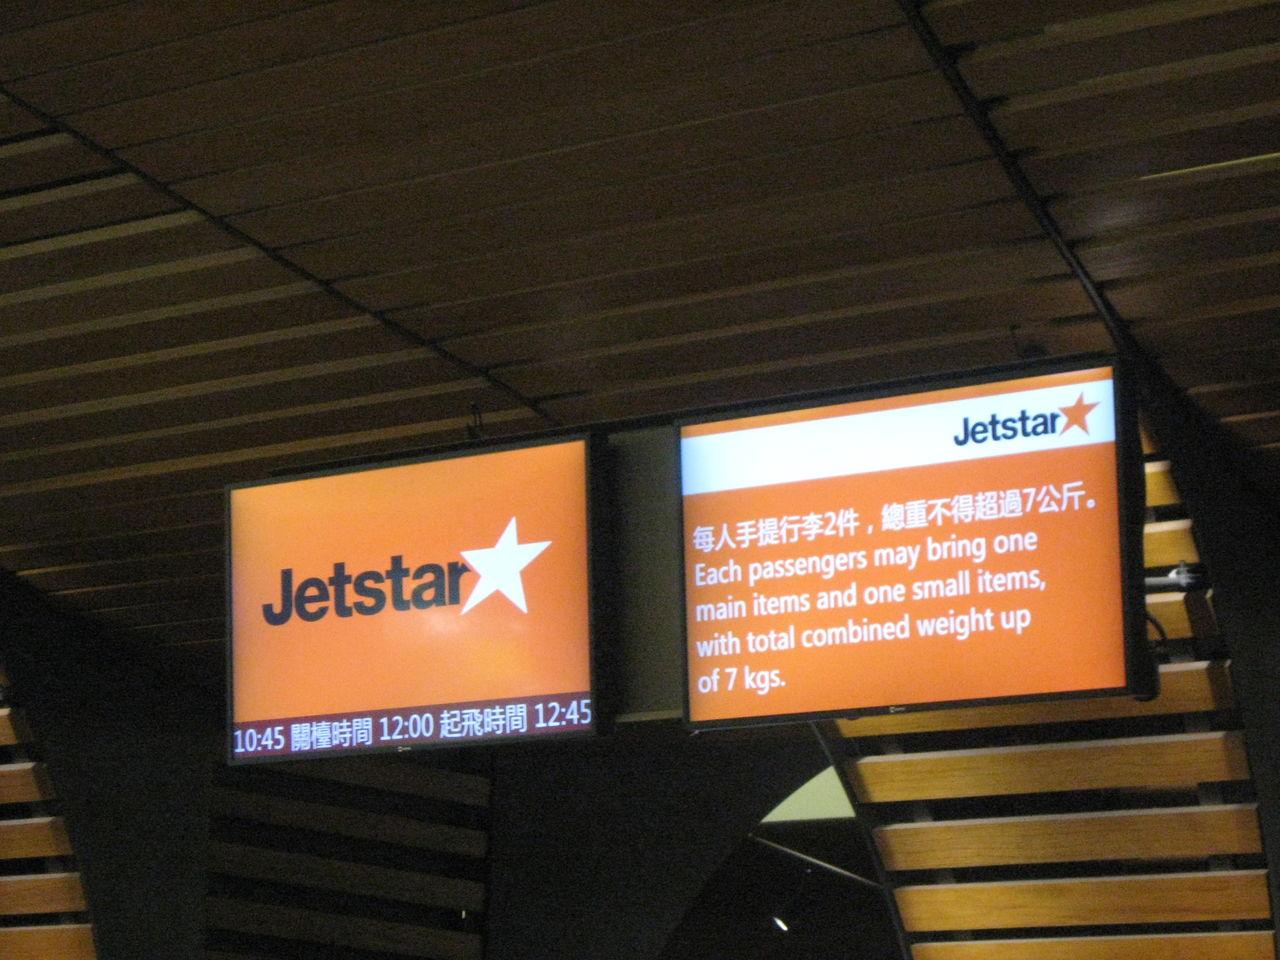 SKE48とエアバスA380超絶推し男のblog   STAR LIGHT~ジェットスター・アジア3K721便で台北(桃園)から大阪(関西)へ(その1) コメントトラックバック                  ske380_800